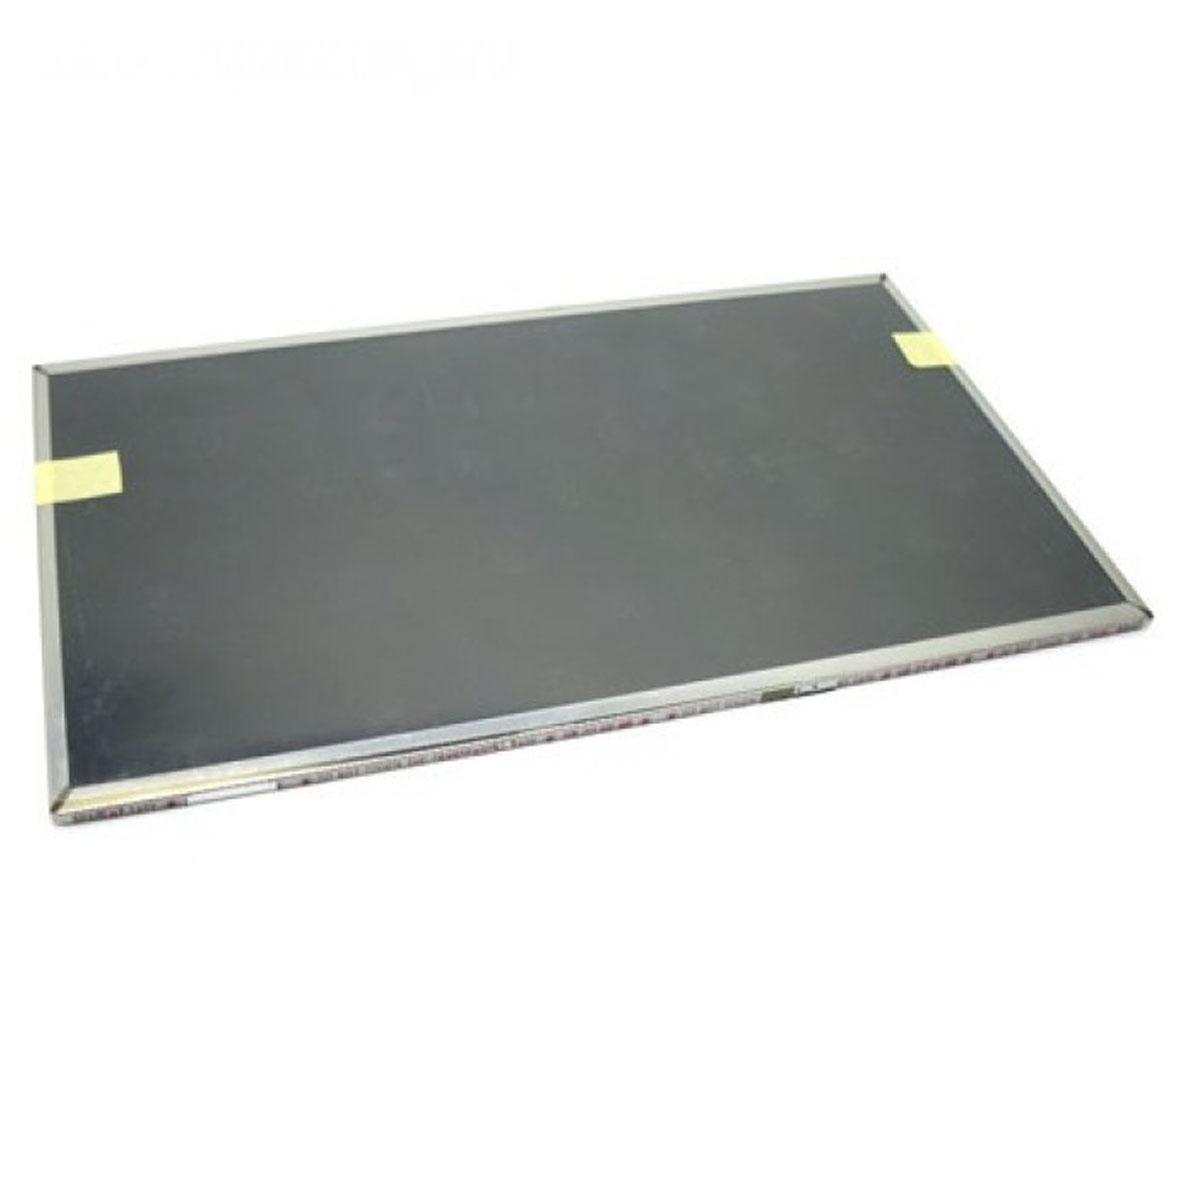 Buy 15 6 WXGA Laptop LED Screen for Dell Inspiron 1545